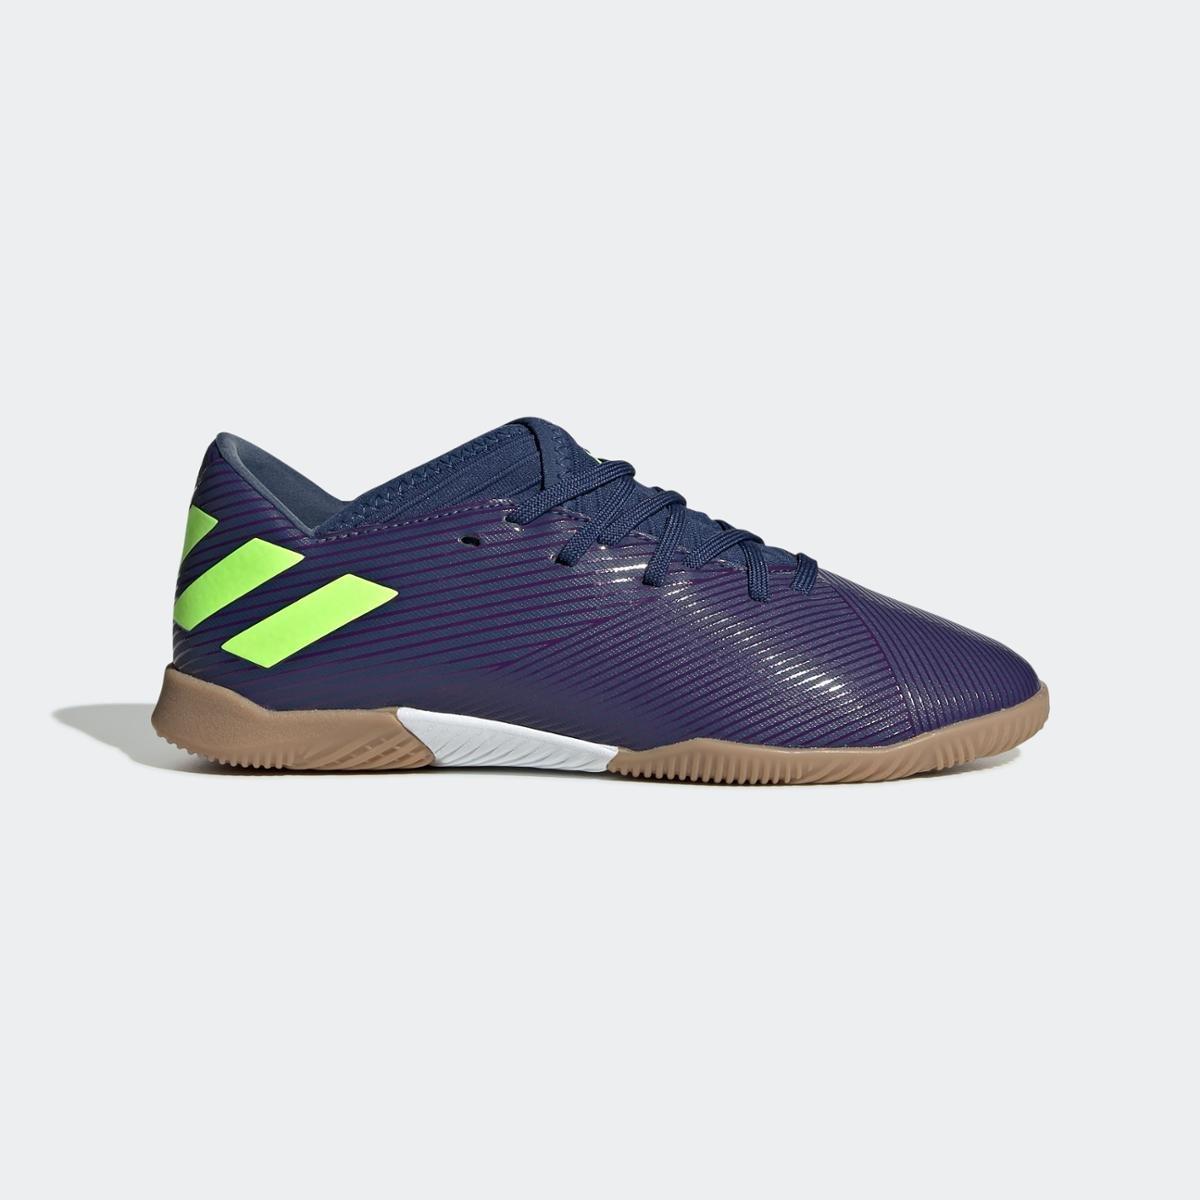 Chuteira Messi 19.3 Futsal Tech Indigo Adidas Infantil